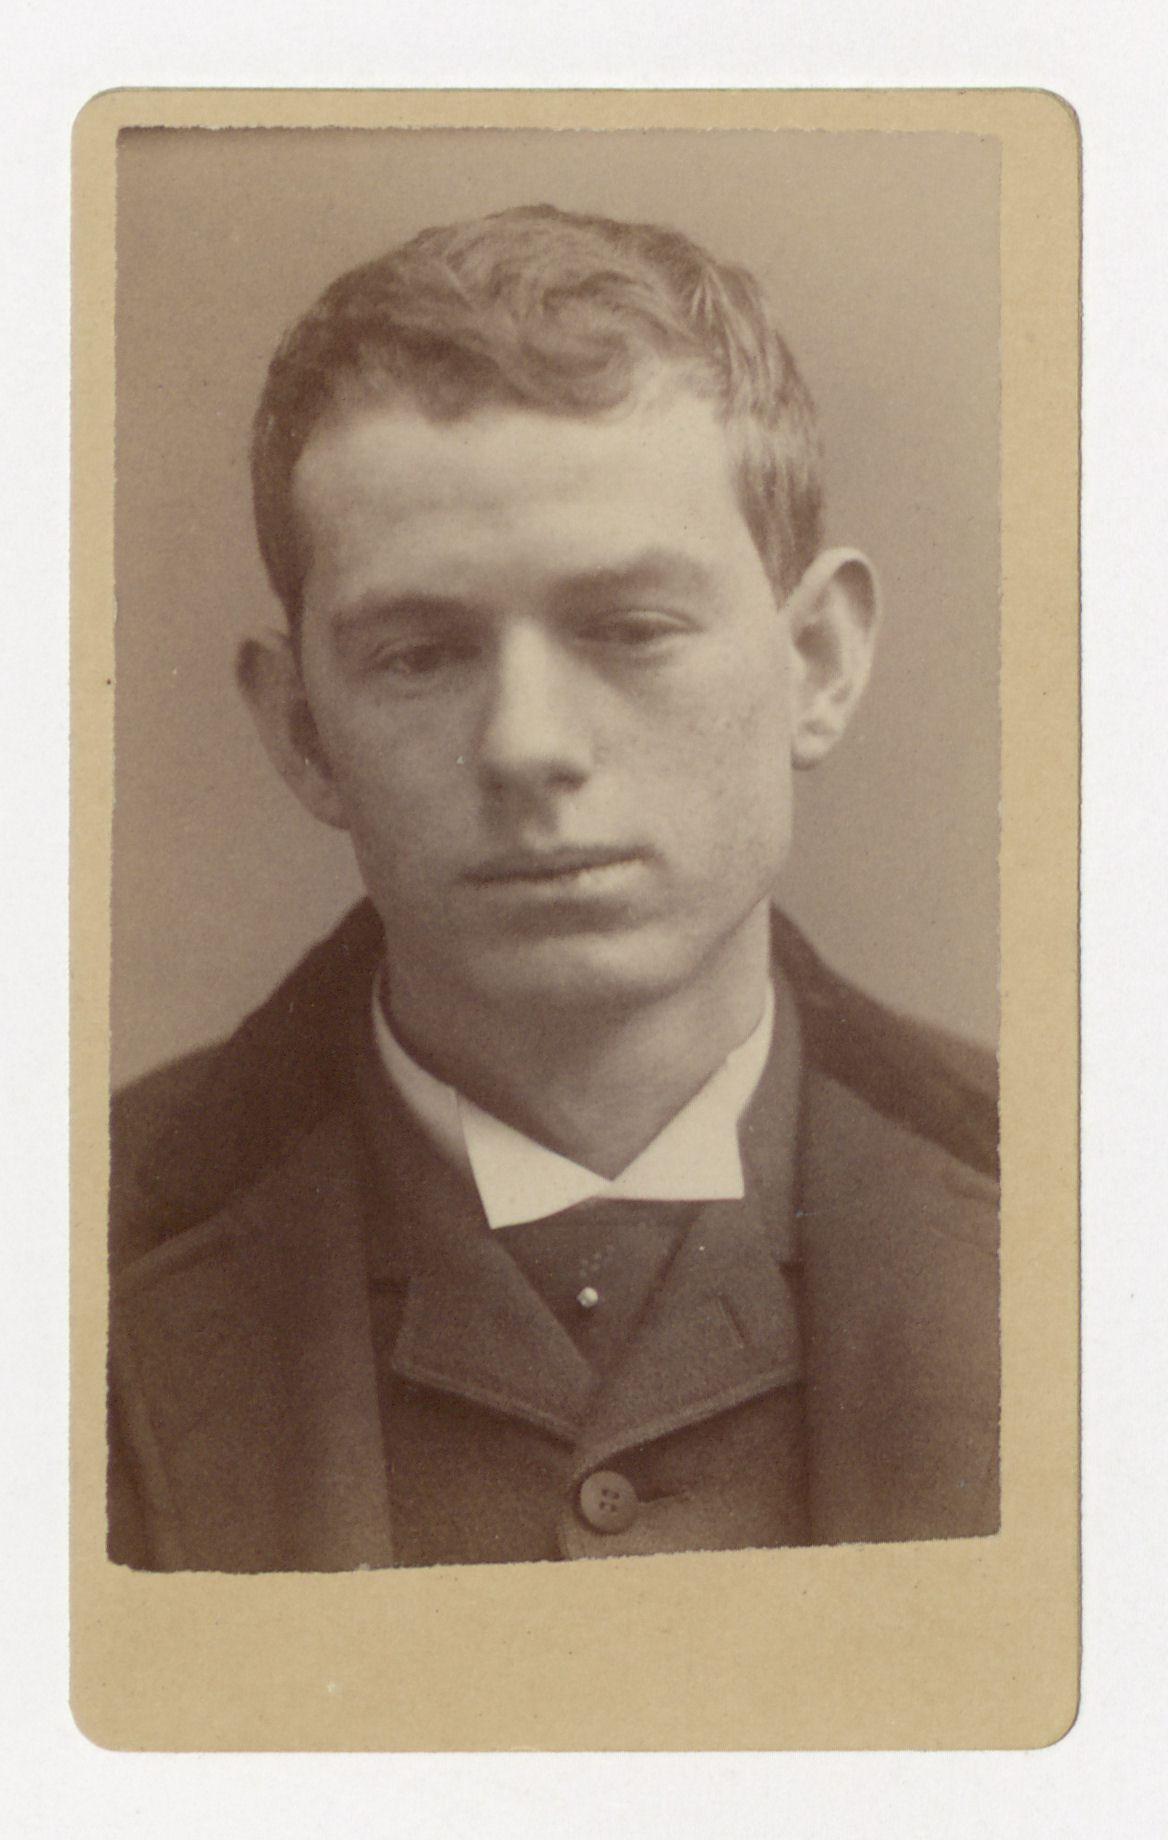 Identification Card No. 403, John Murray